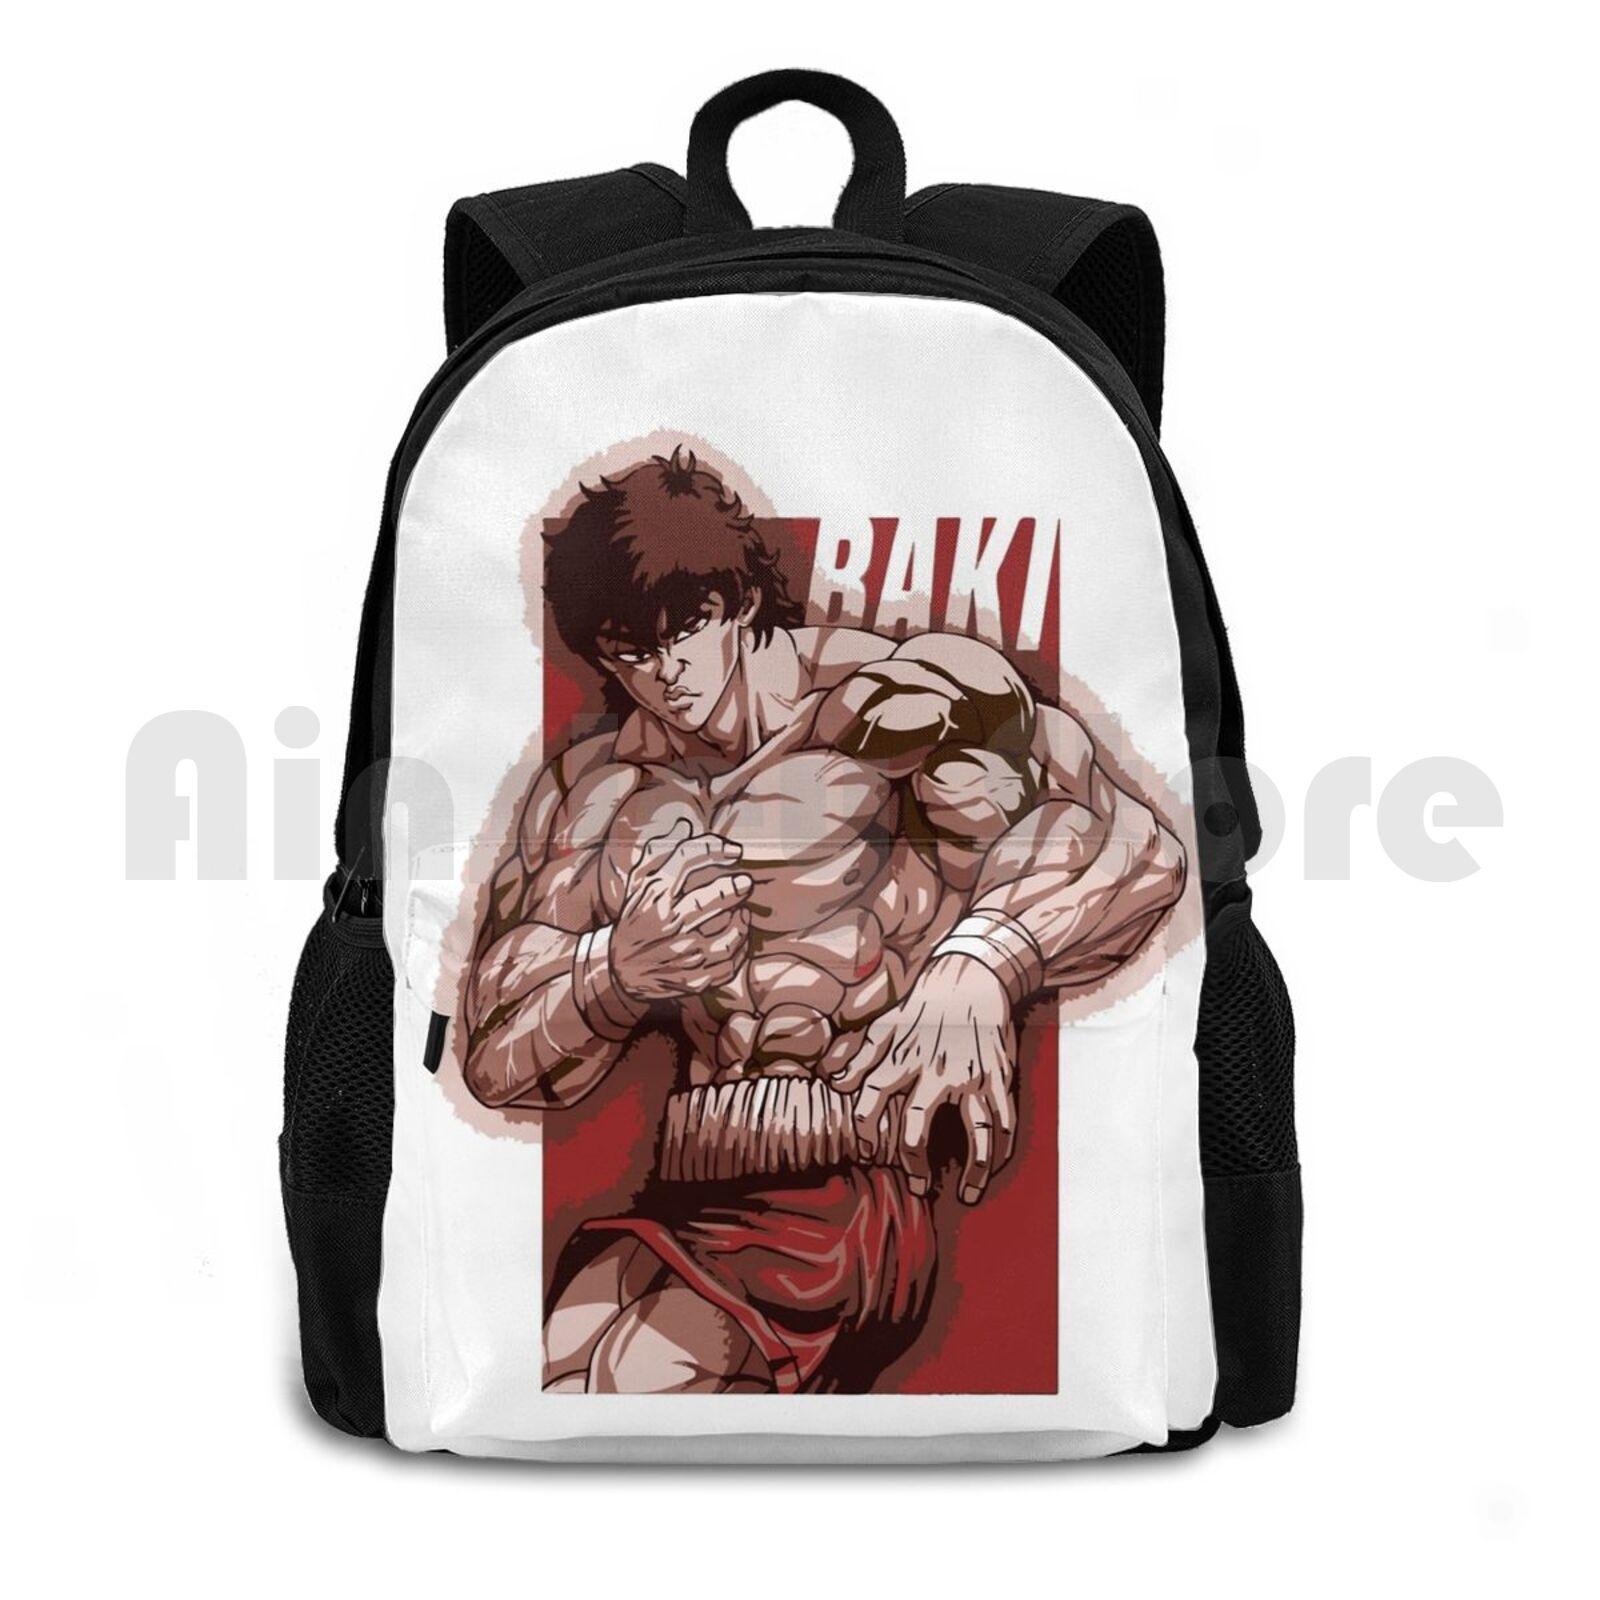 H538277062a1b45d6aedc426230891e31P - Anime Backpacks